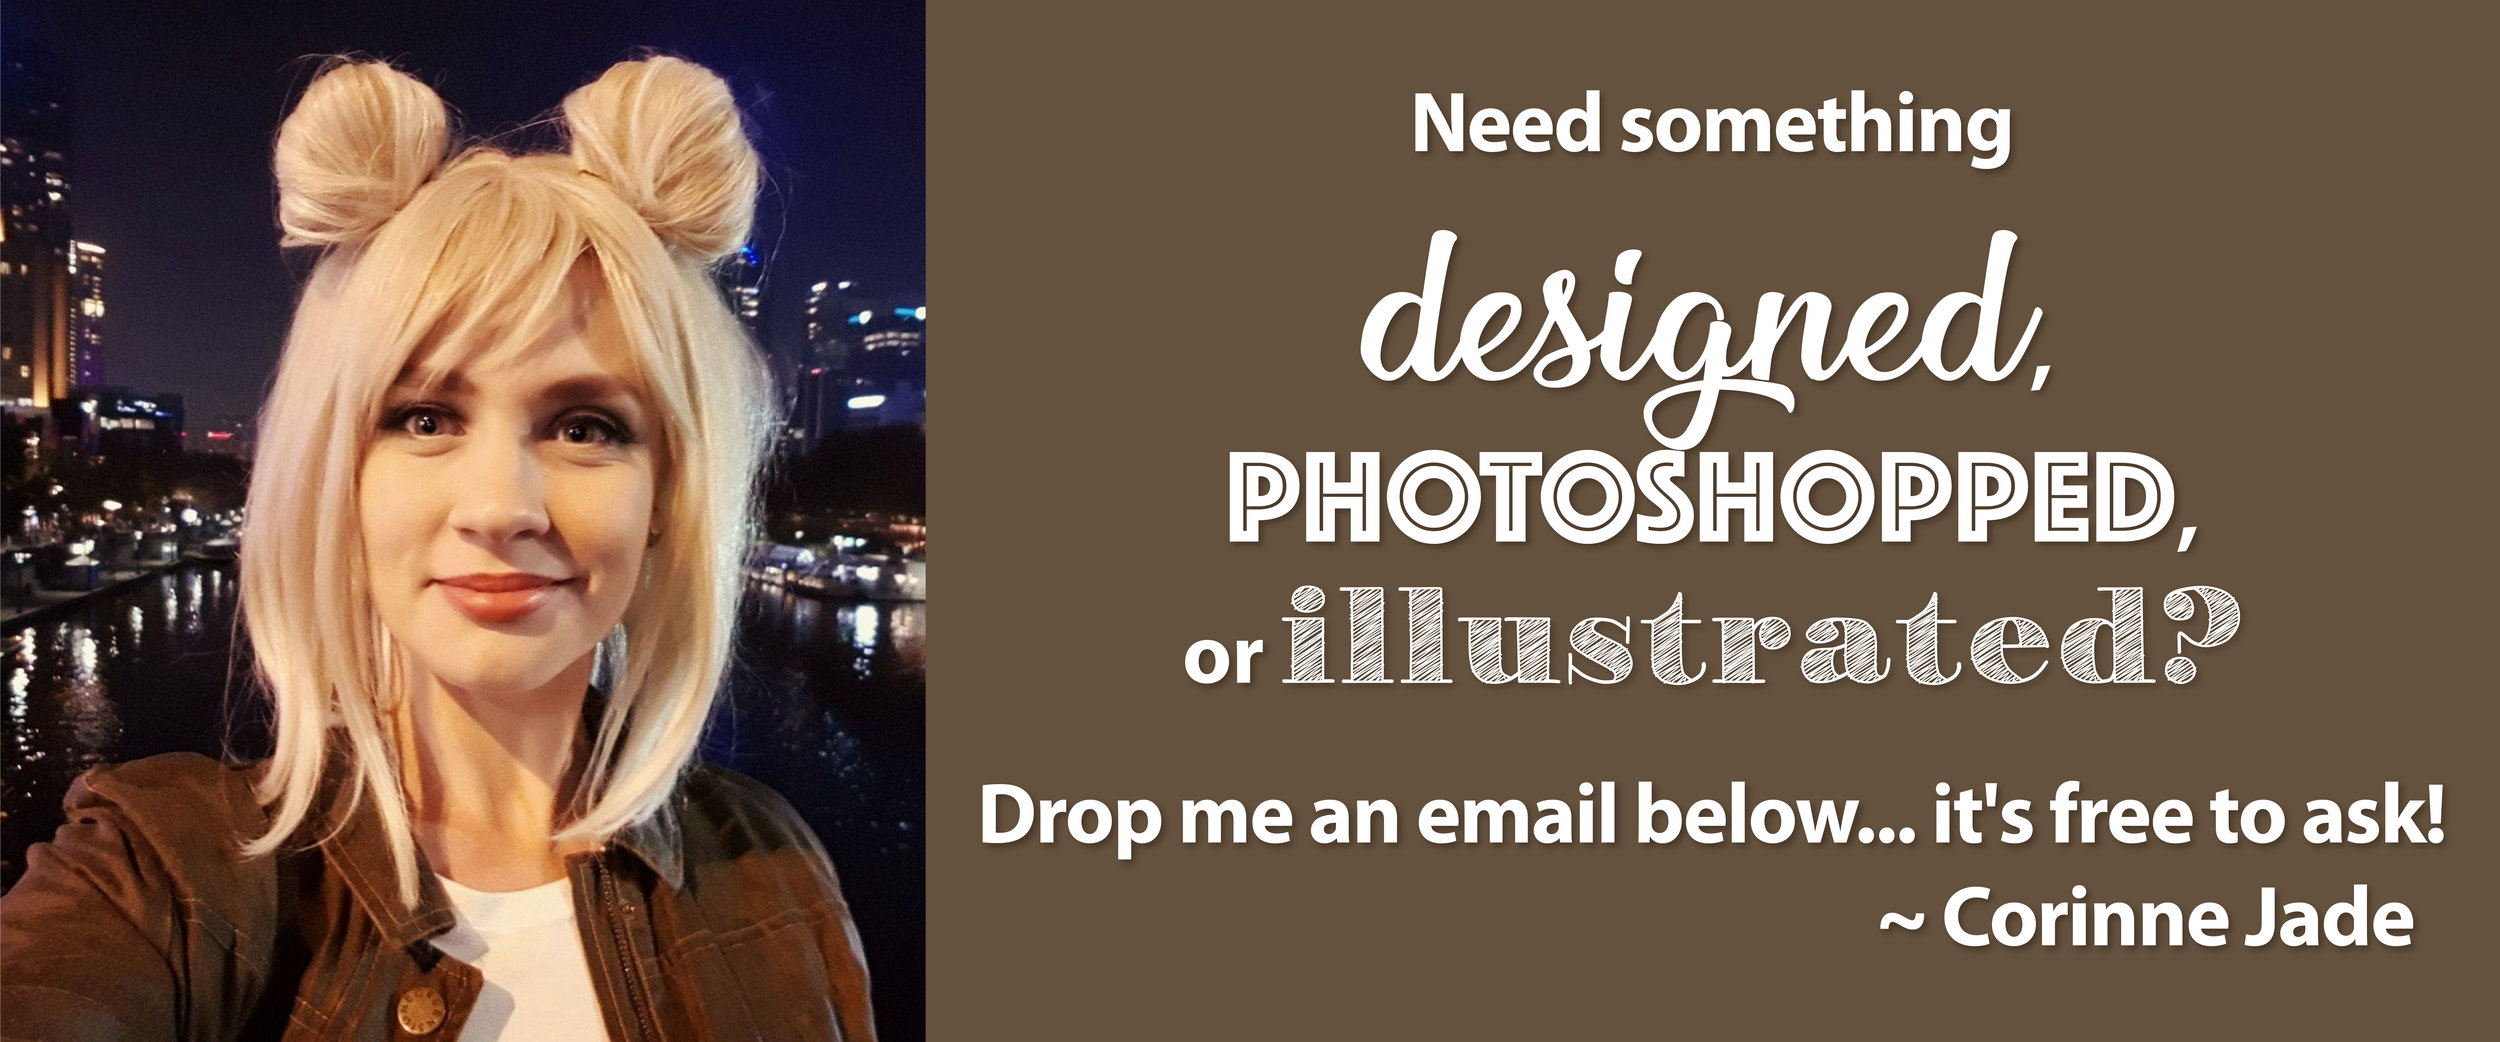 Need something designed2-01.jpg